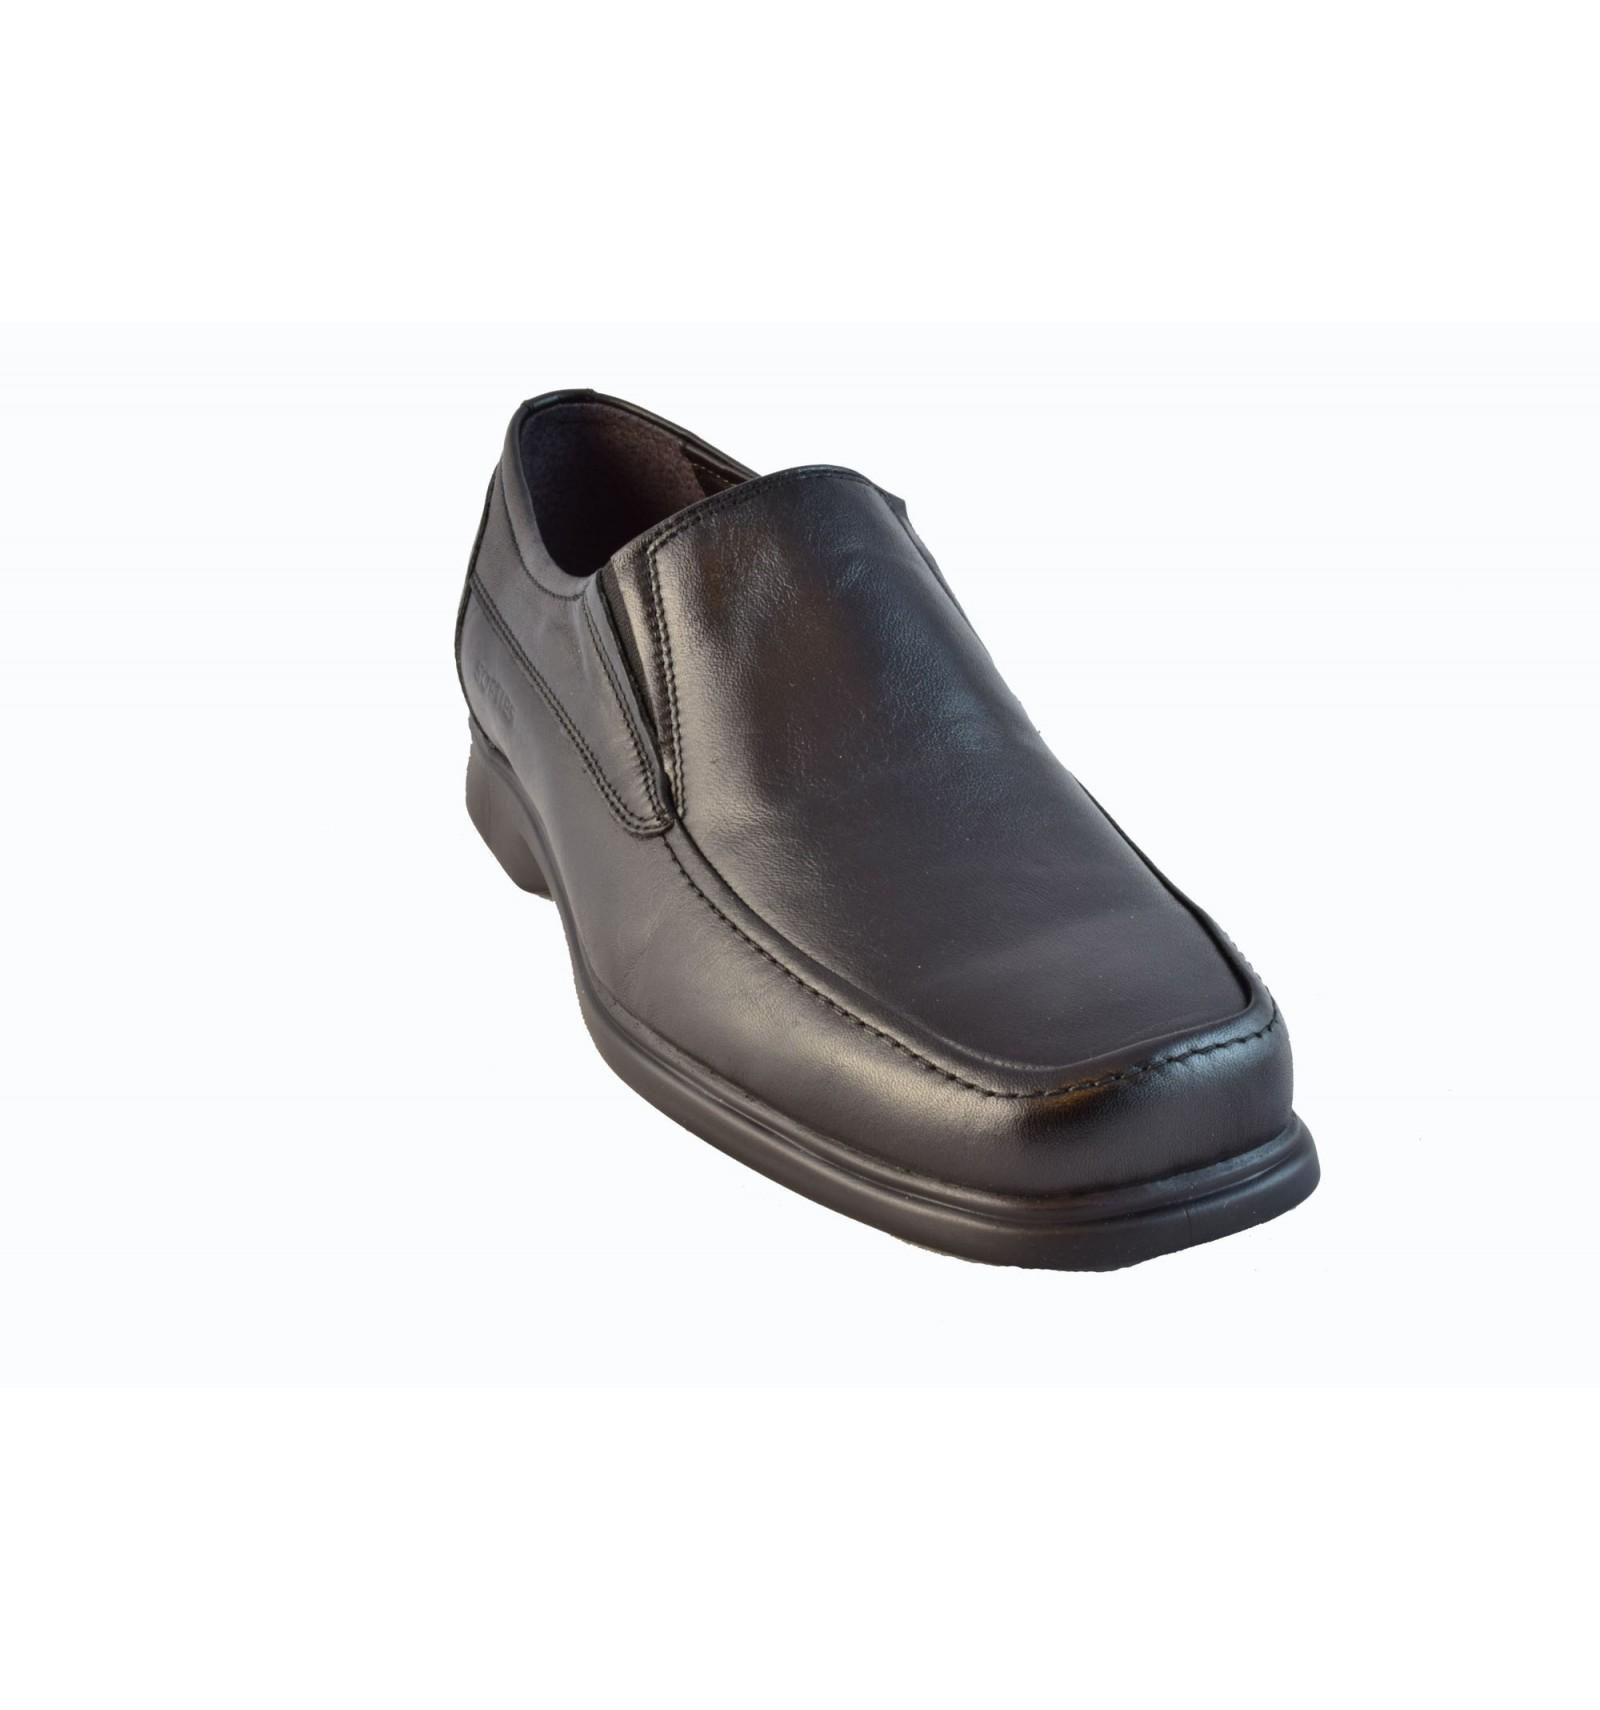 037ae75d228 SOFTIES 4431 - Παπούτσια Alva - Φροσυνιώτης